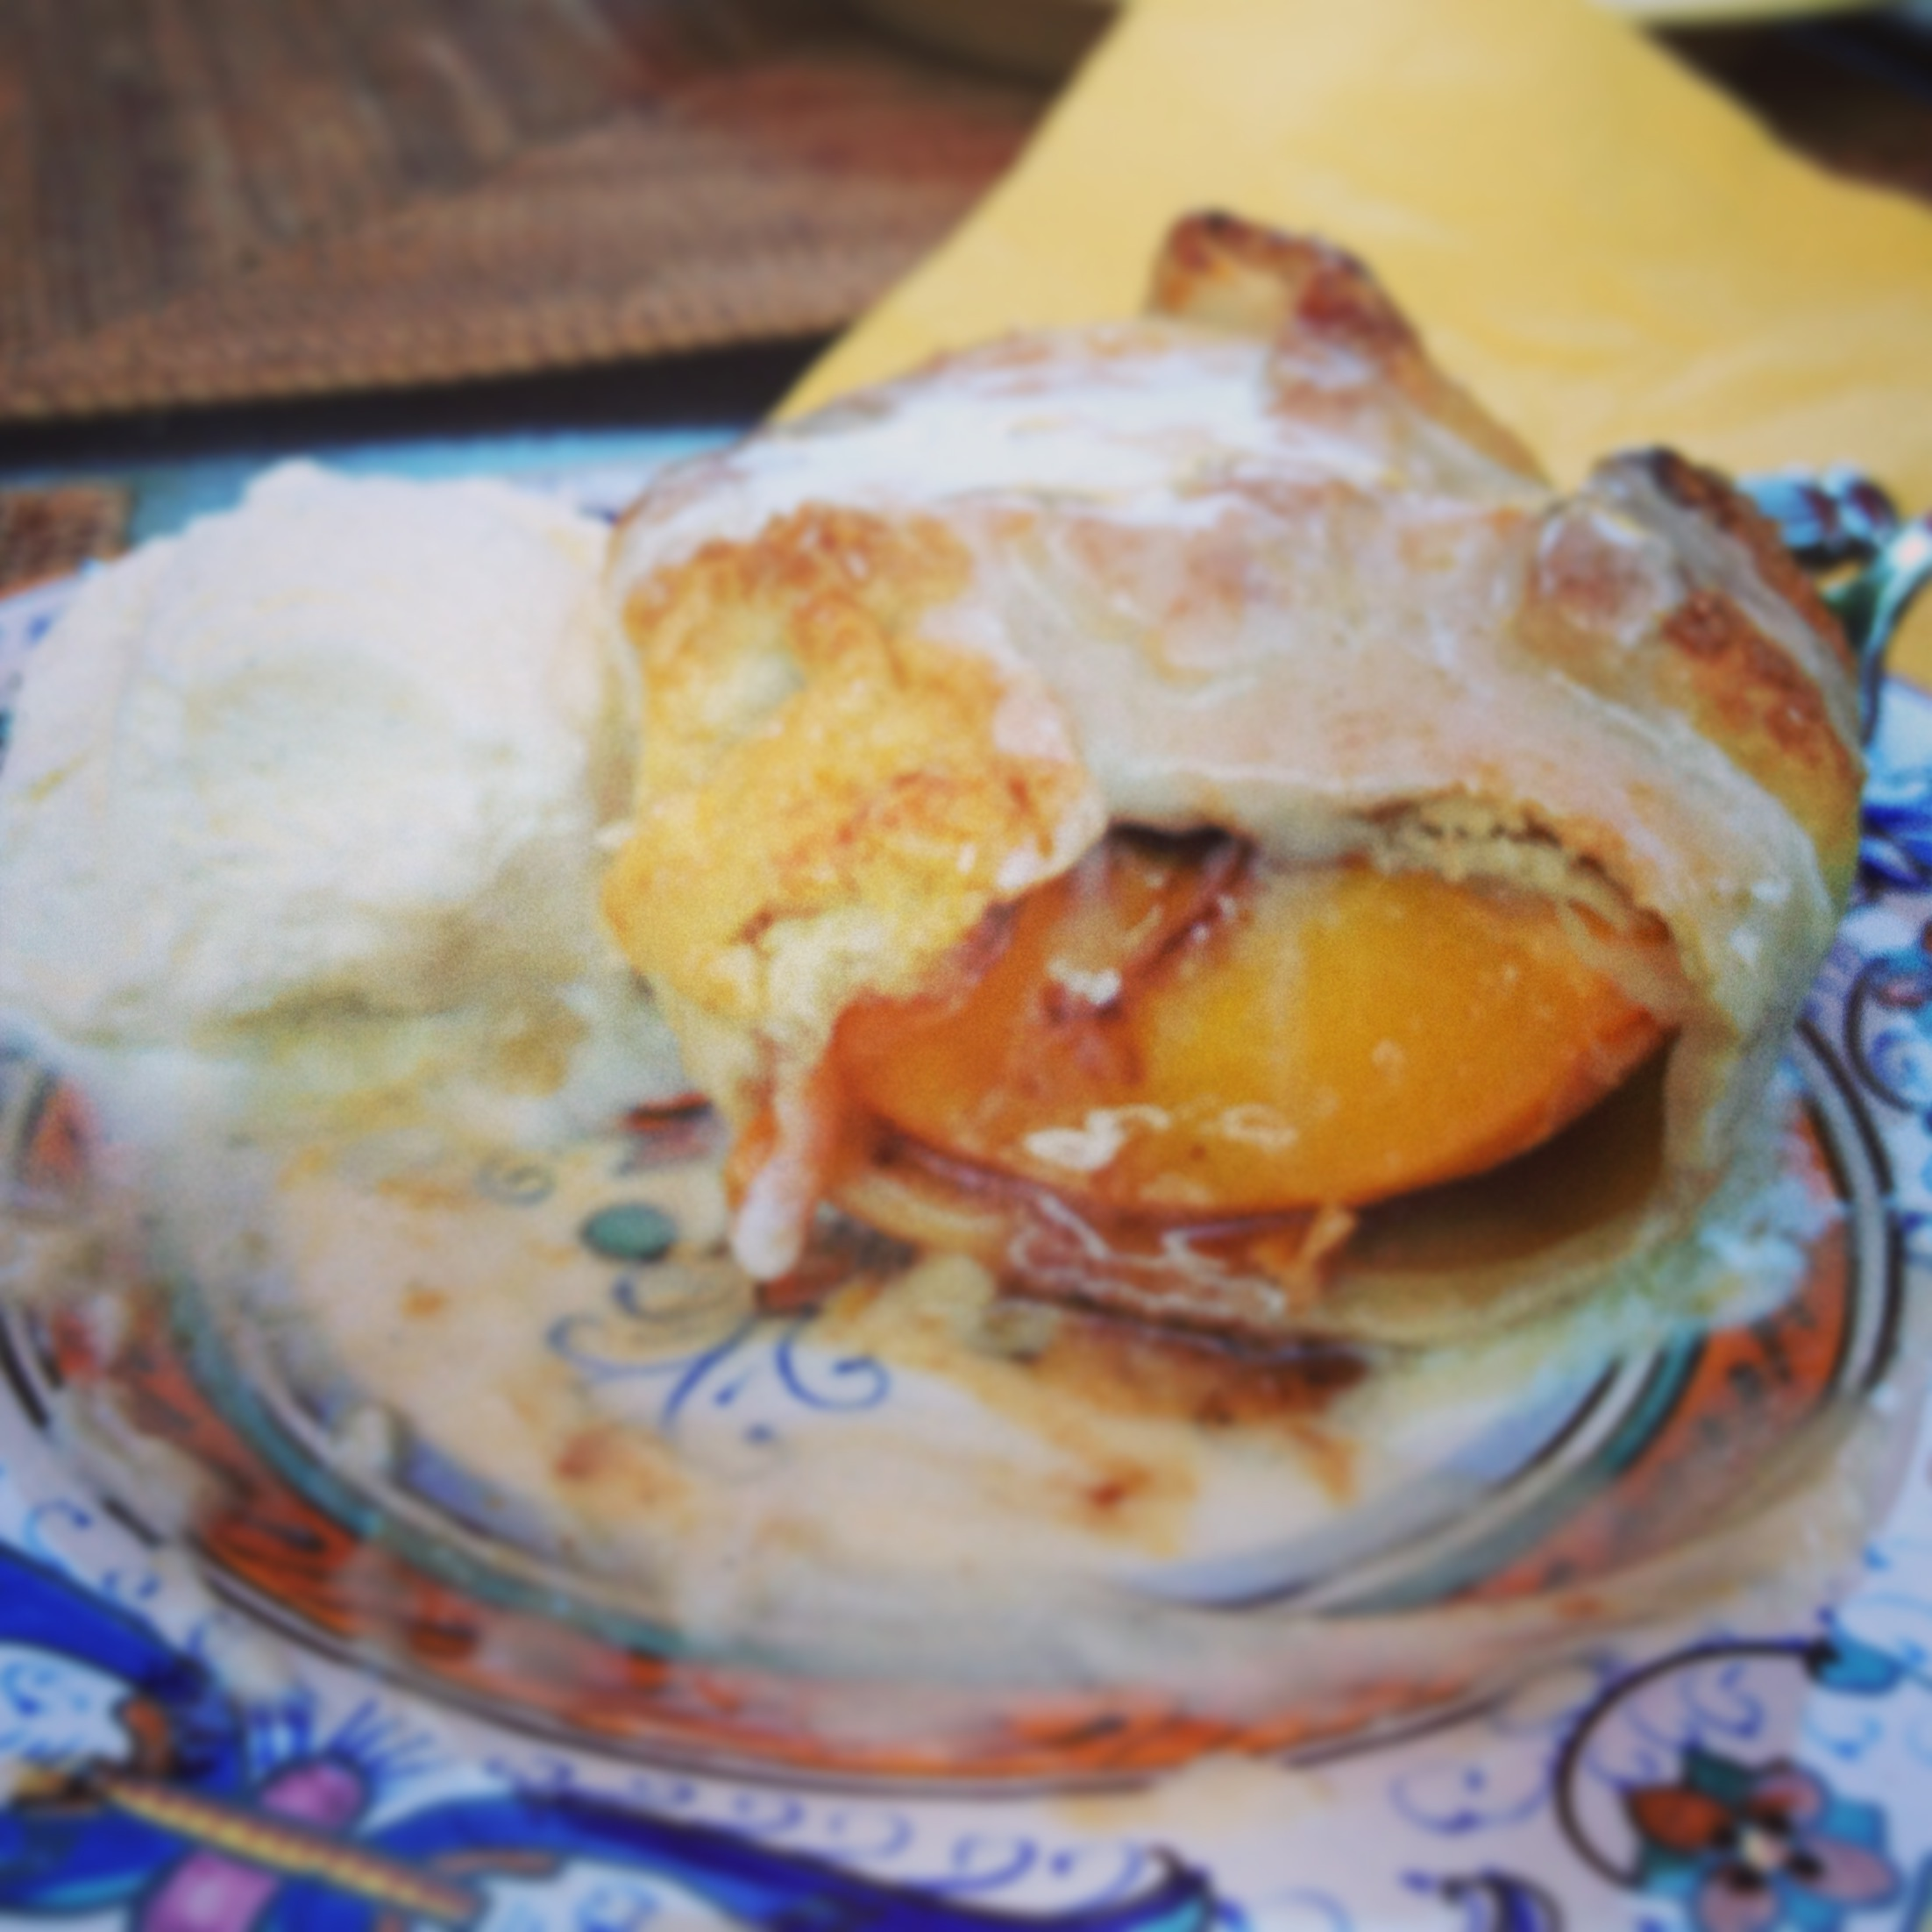 ... Peach Dumplings with Bourbon Hard Sauce | Blueberries & Basil